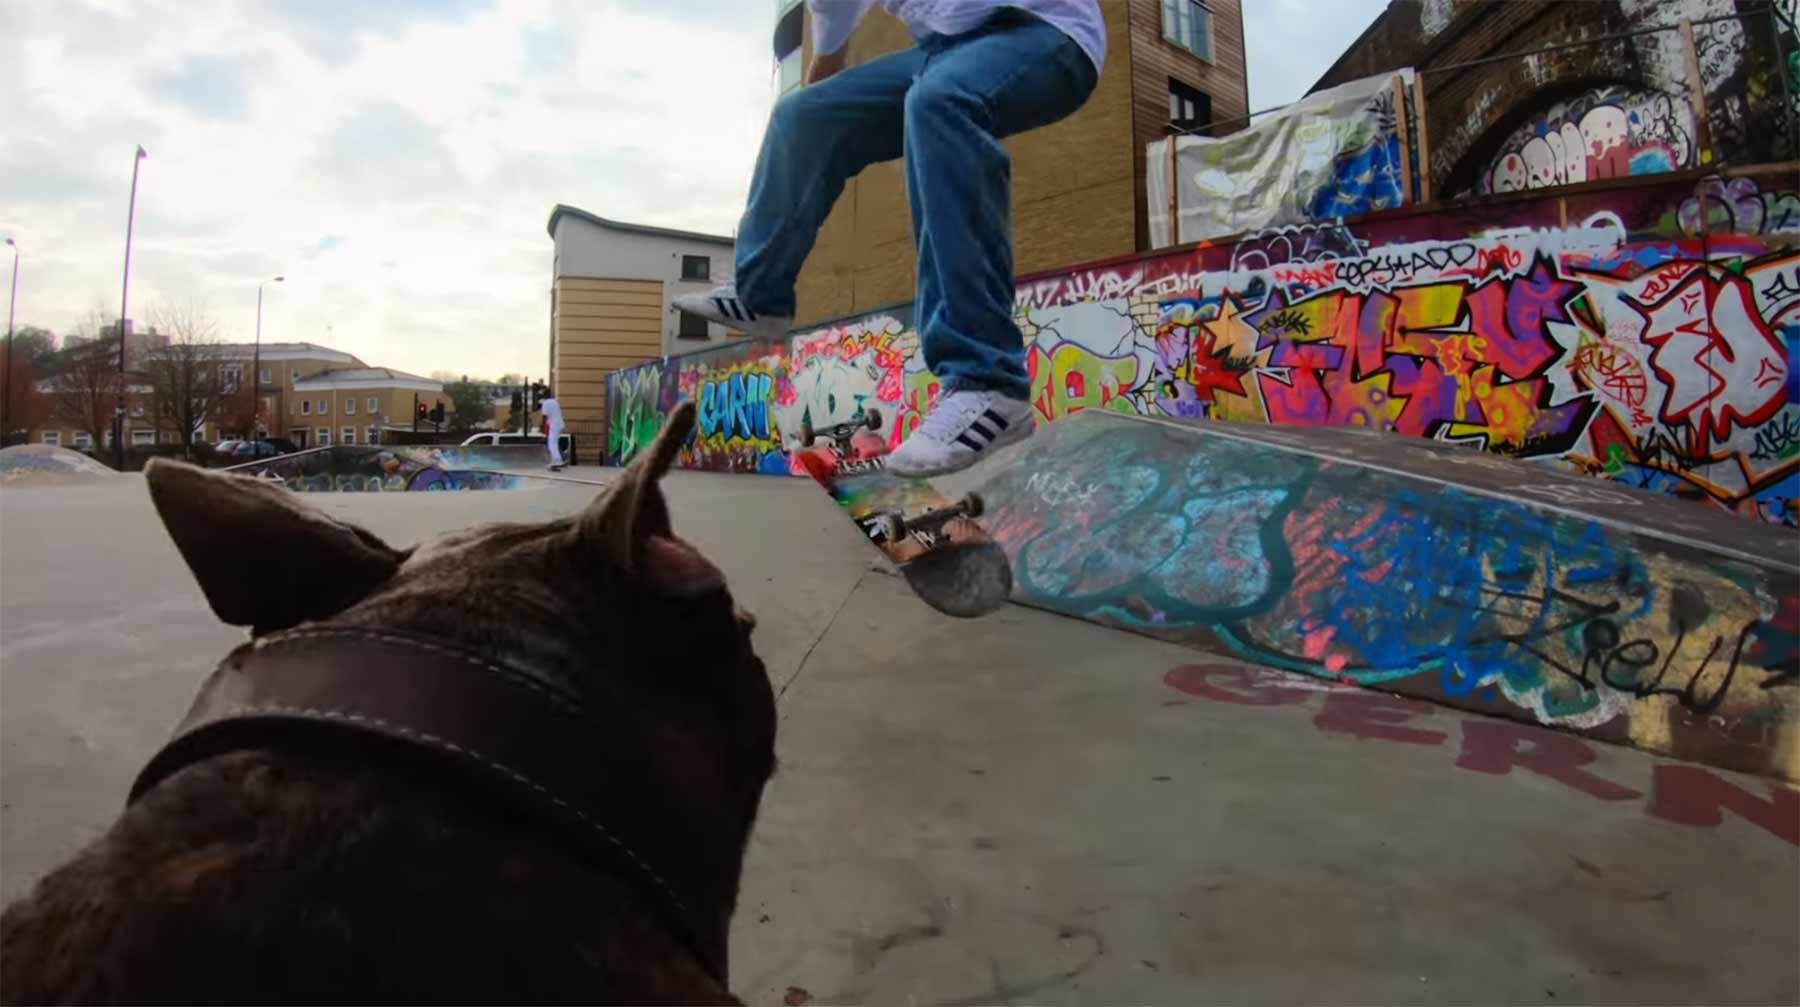 Hund als Verfolgungskamera im Skate-Park hund-pov-kamera-im-skatepark